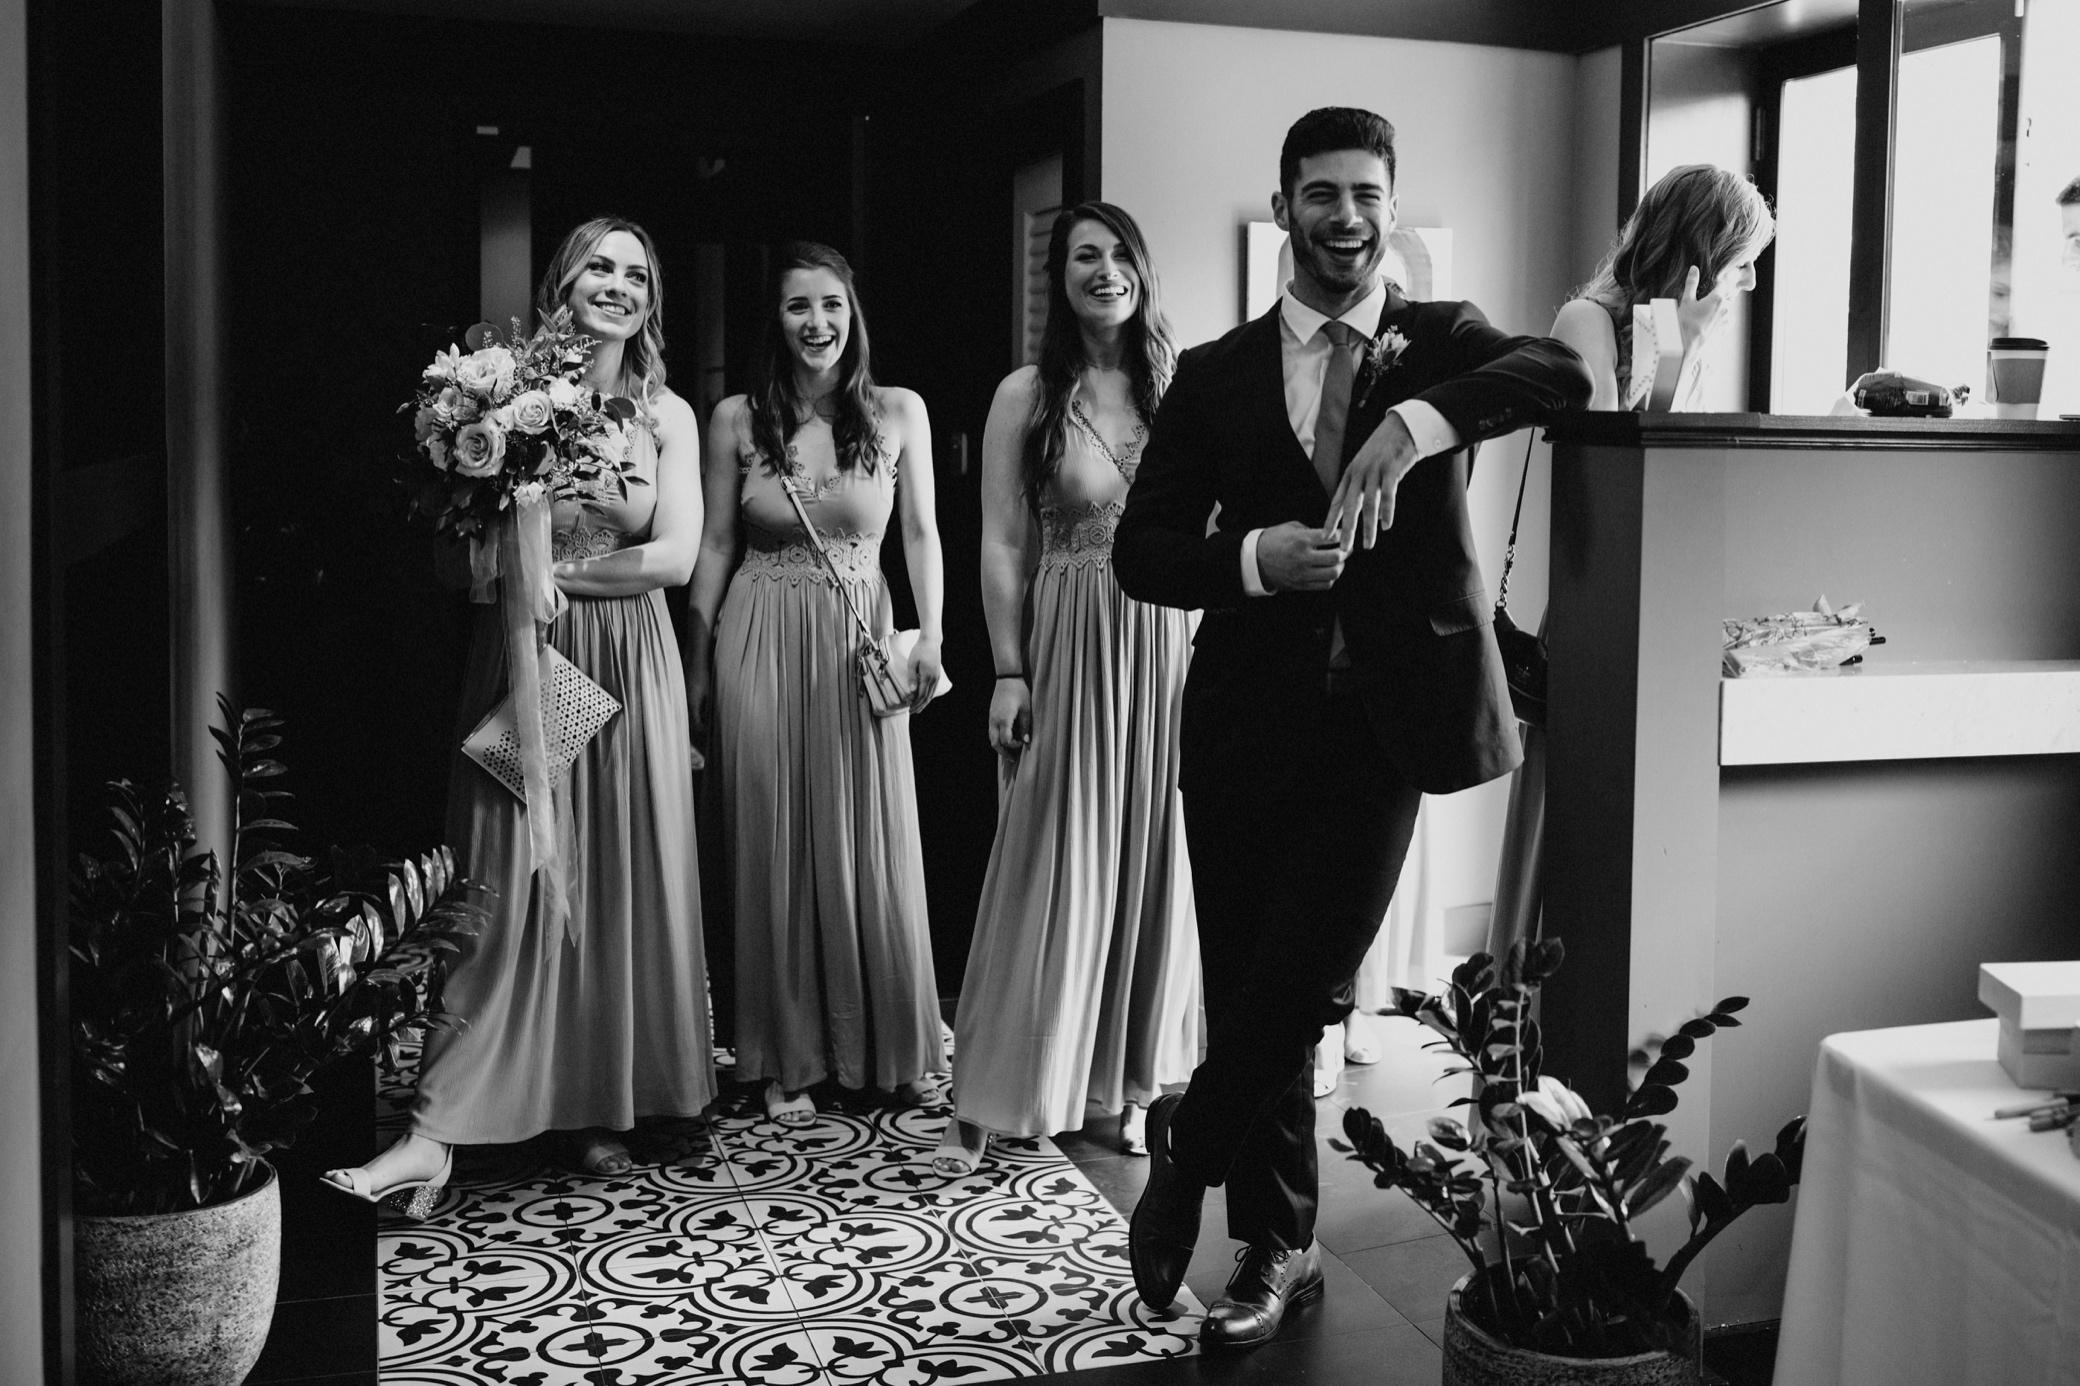 031_The Broadview Hotel Wedding (196 of 913).jpg